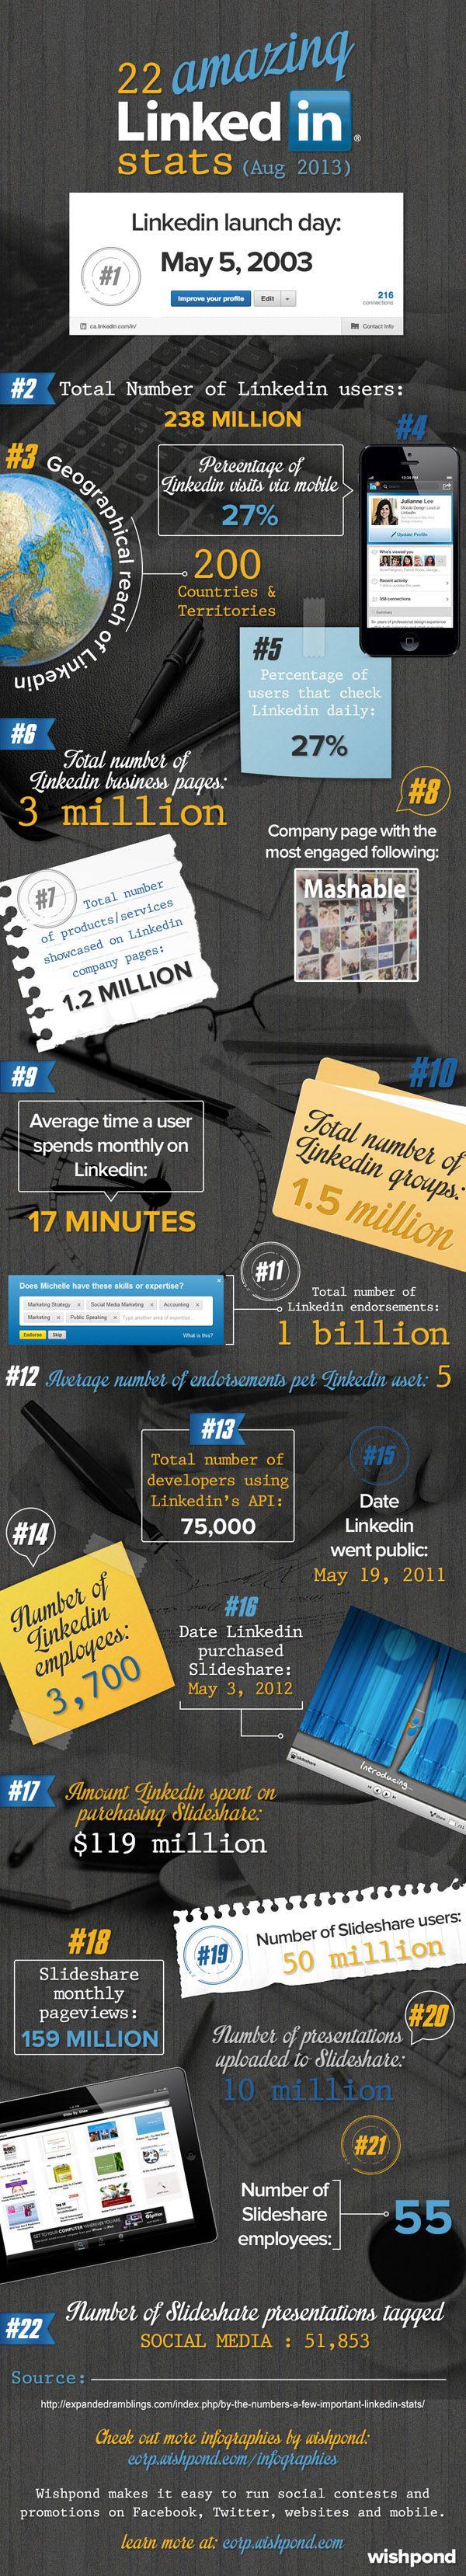 22 Amazing LinkedIn Stats (SMI)